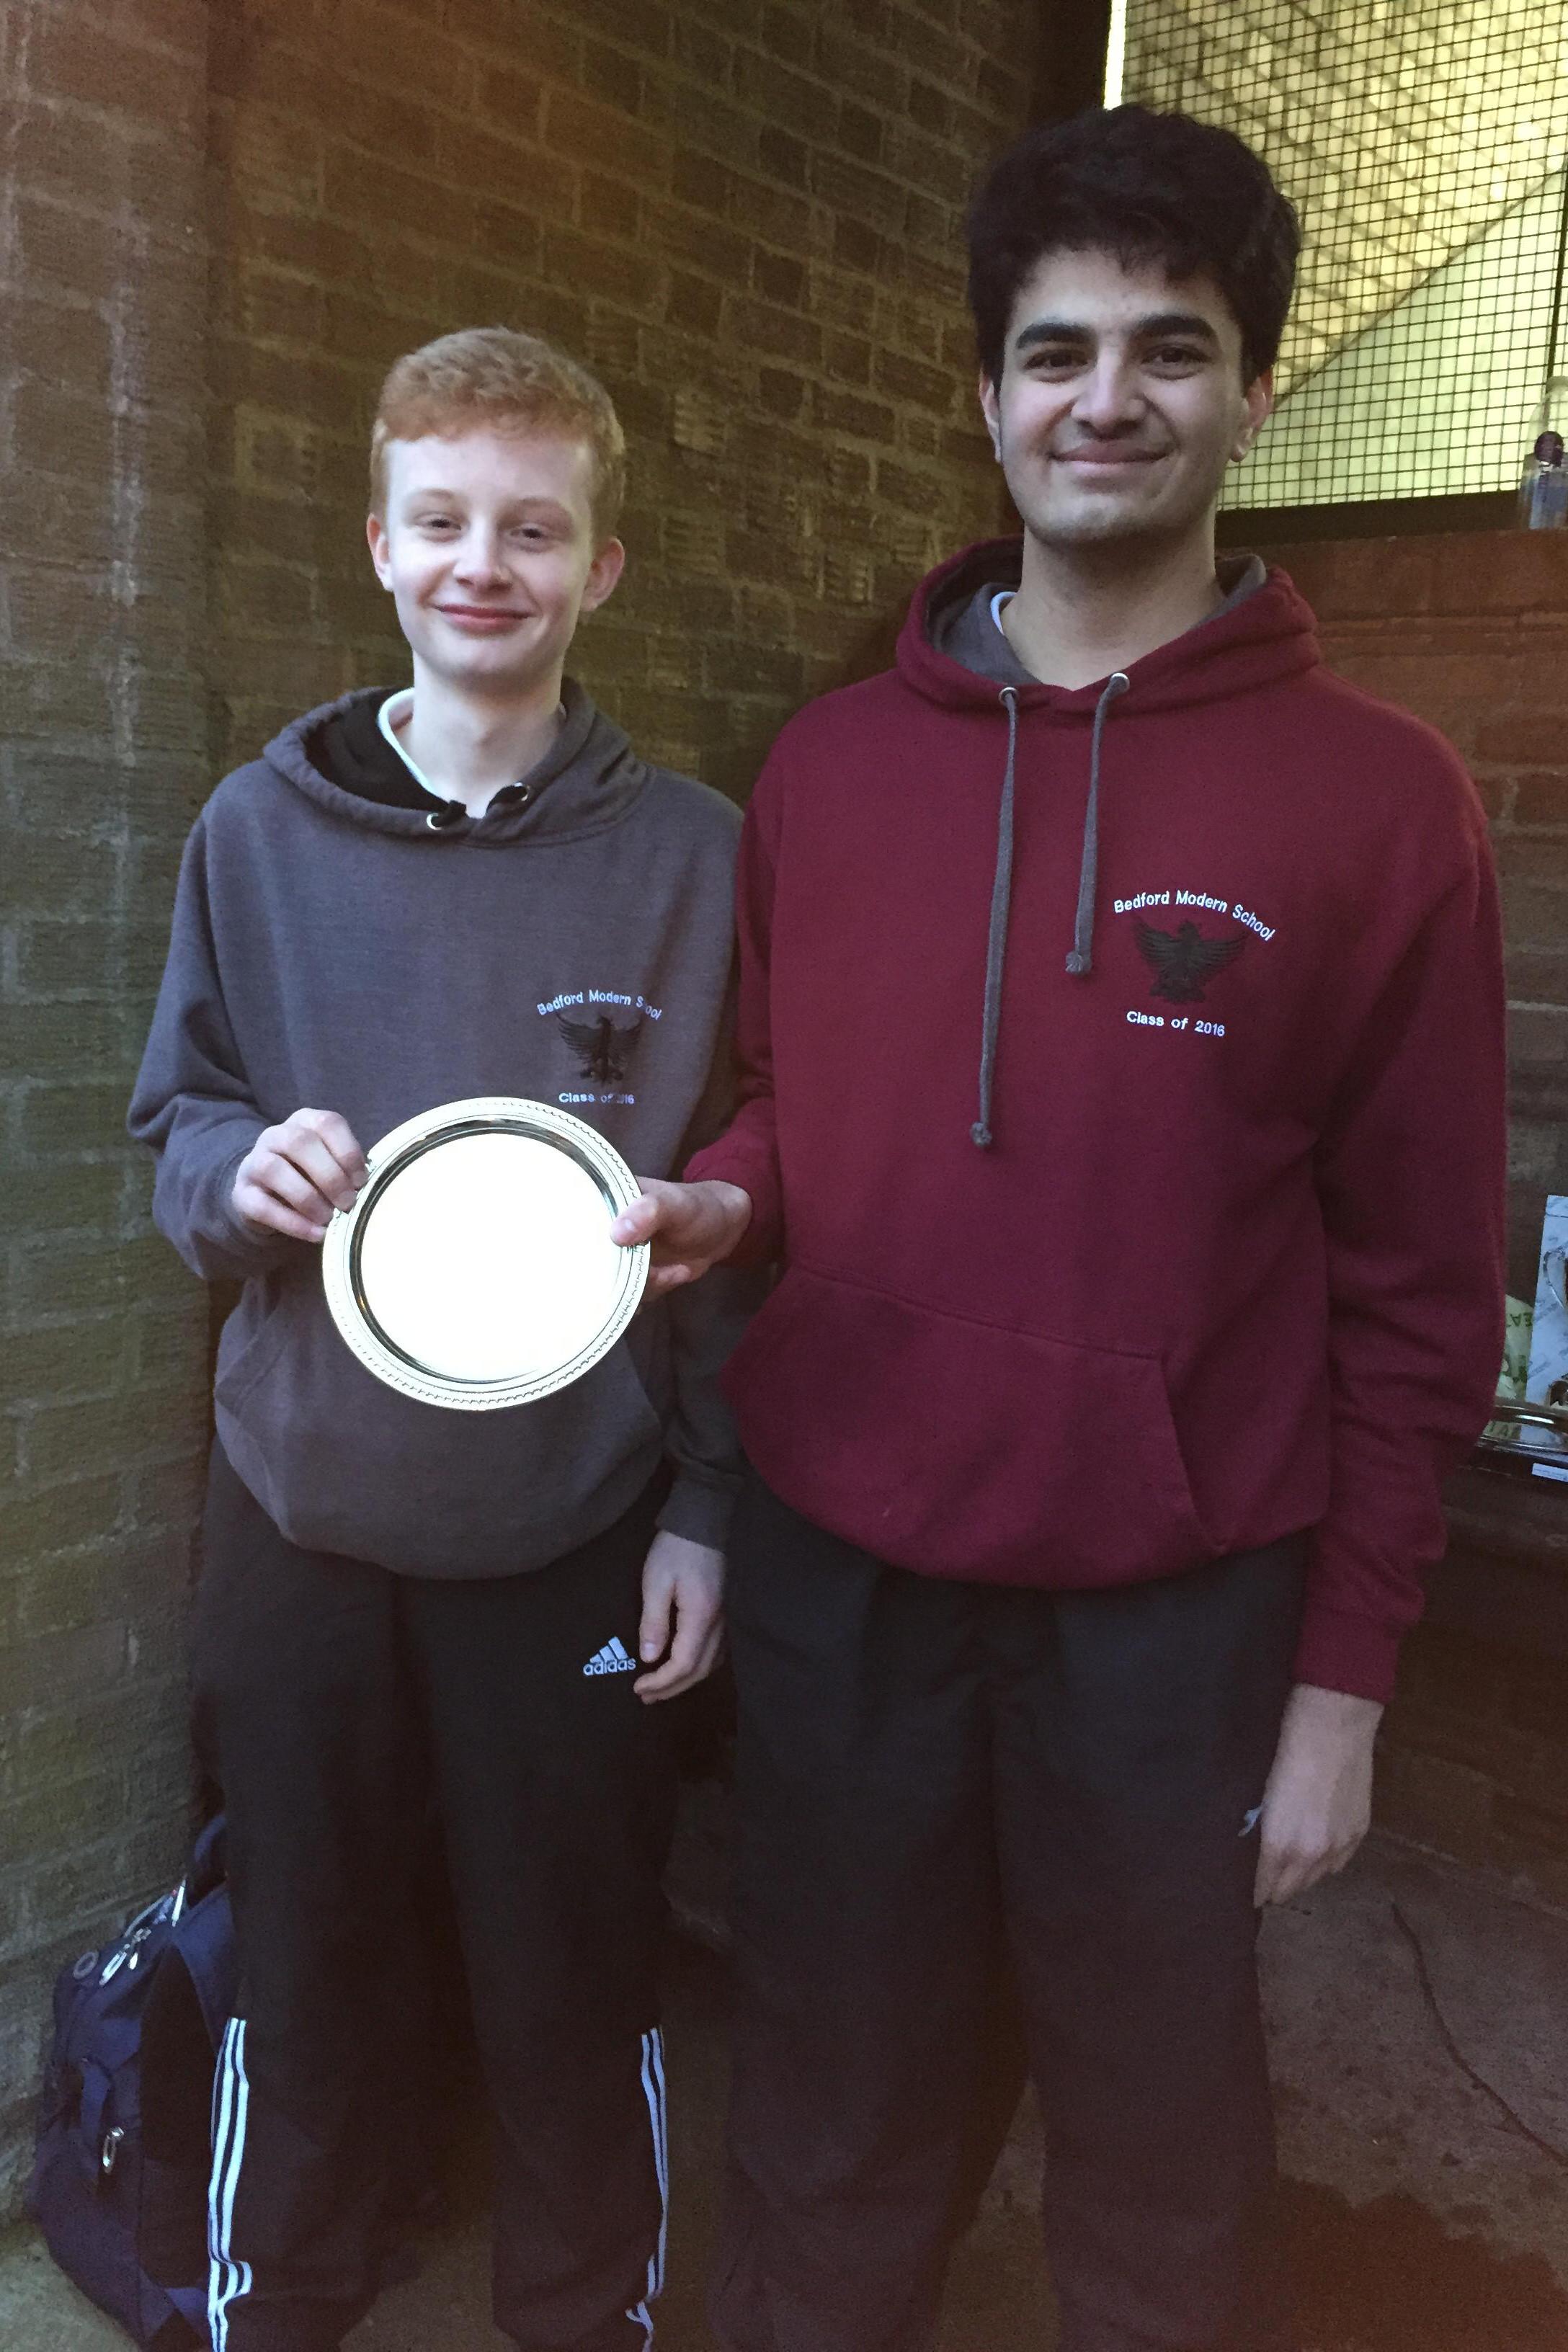 BMS U18 Plate winners Larrington & Pradhan